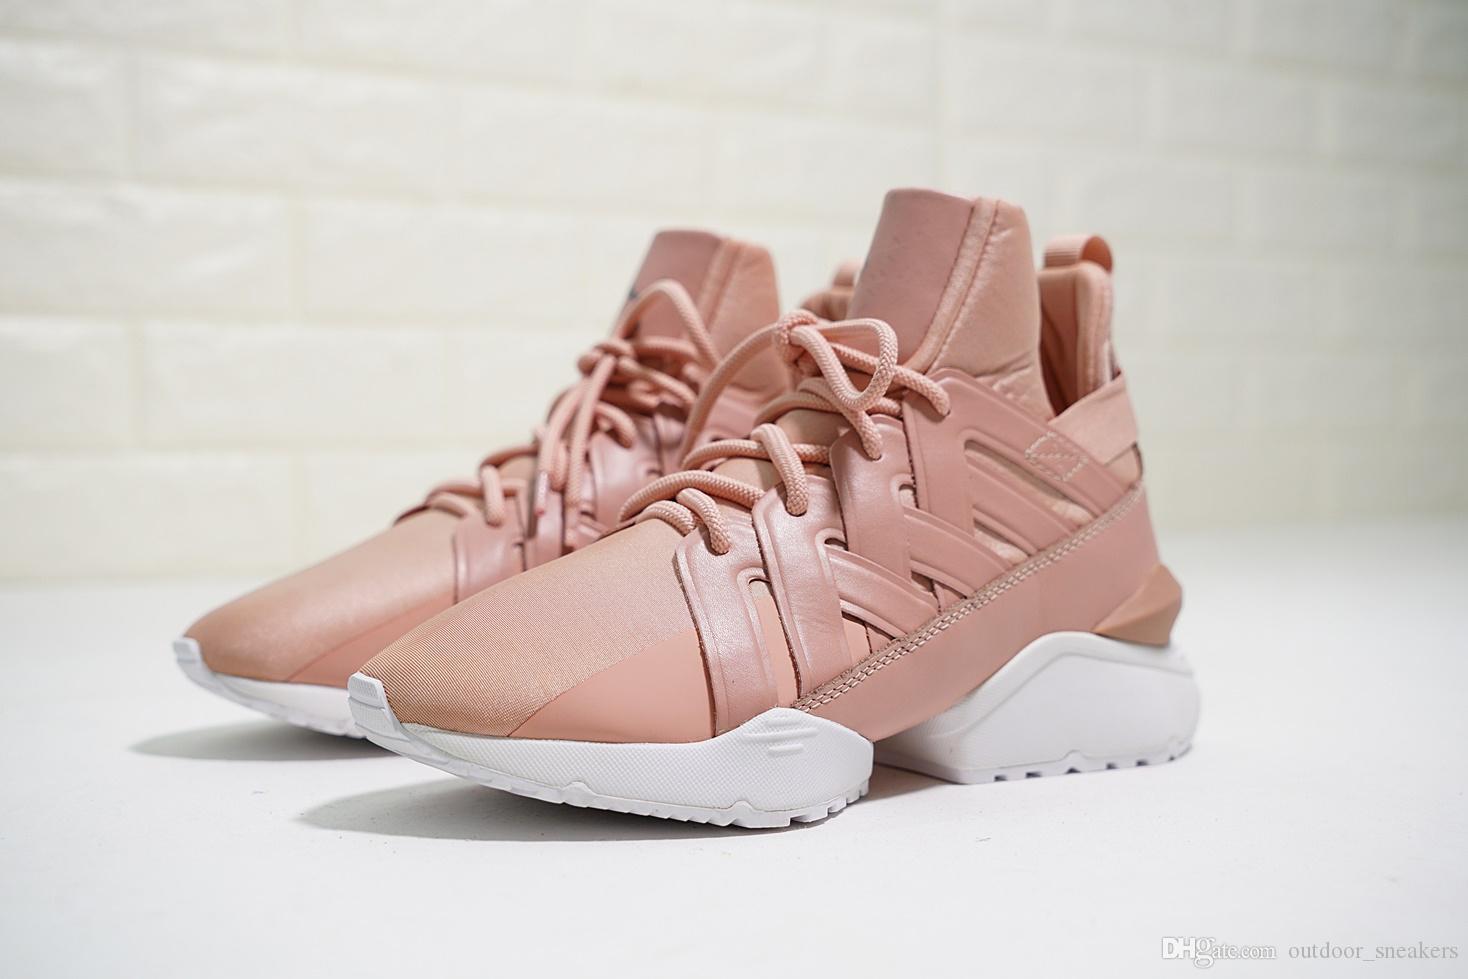 Pink Satin Sale Muse Quality Echo Top 2018 Ep Shoes Hot Fashion nRfq1xwx8